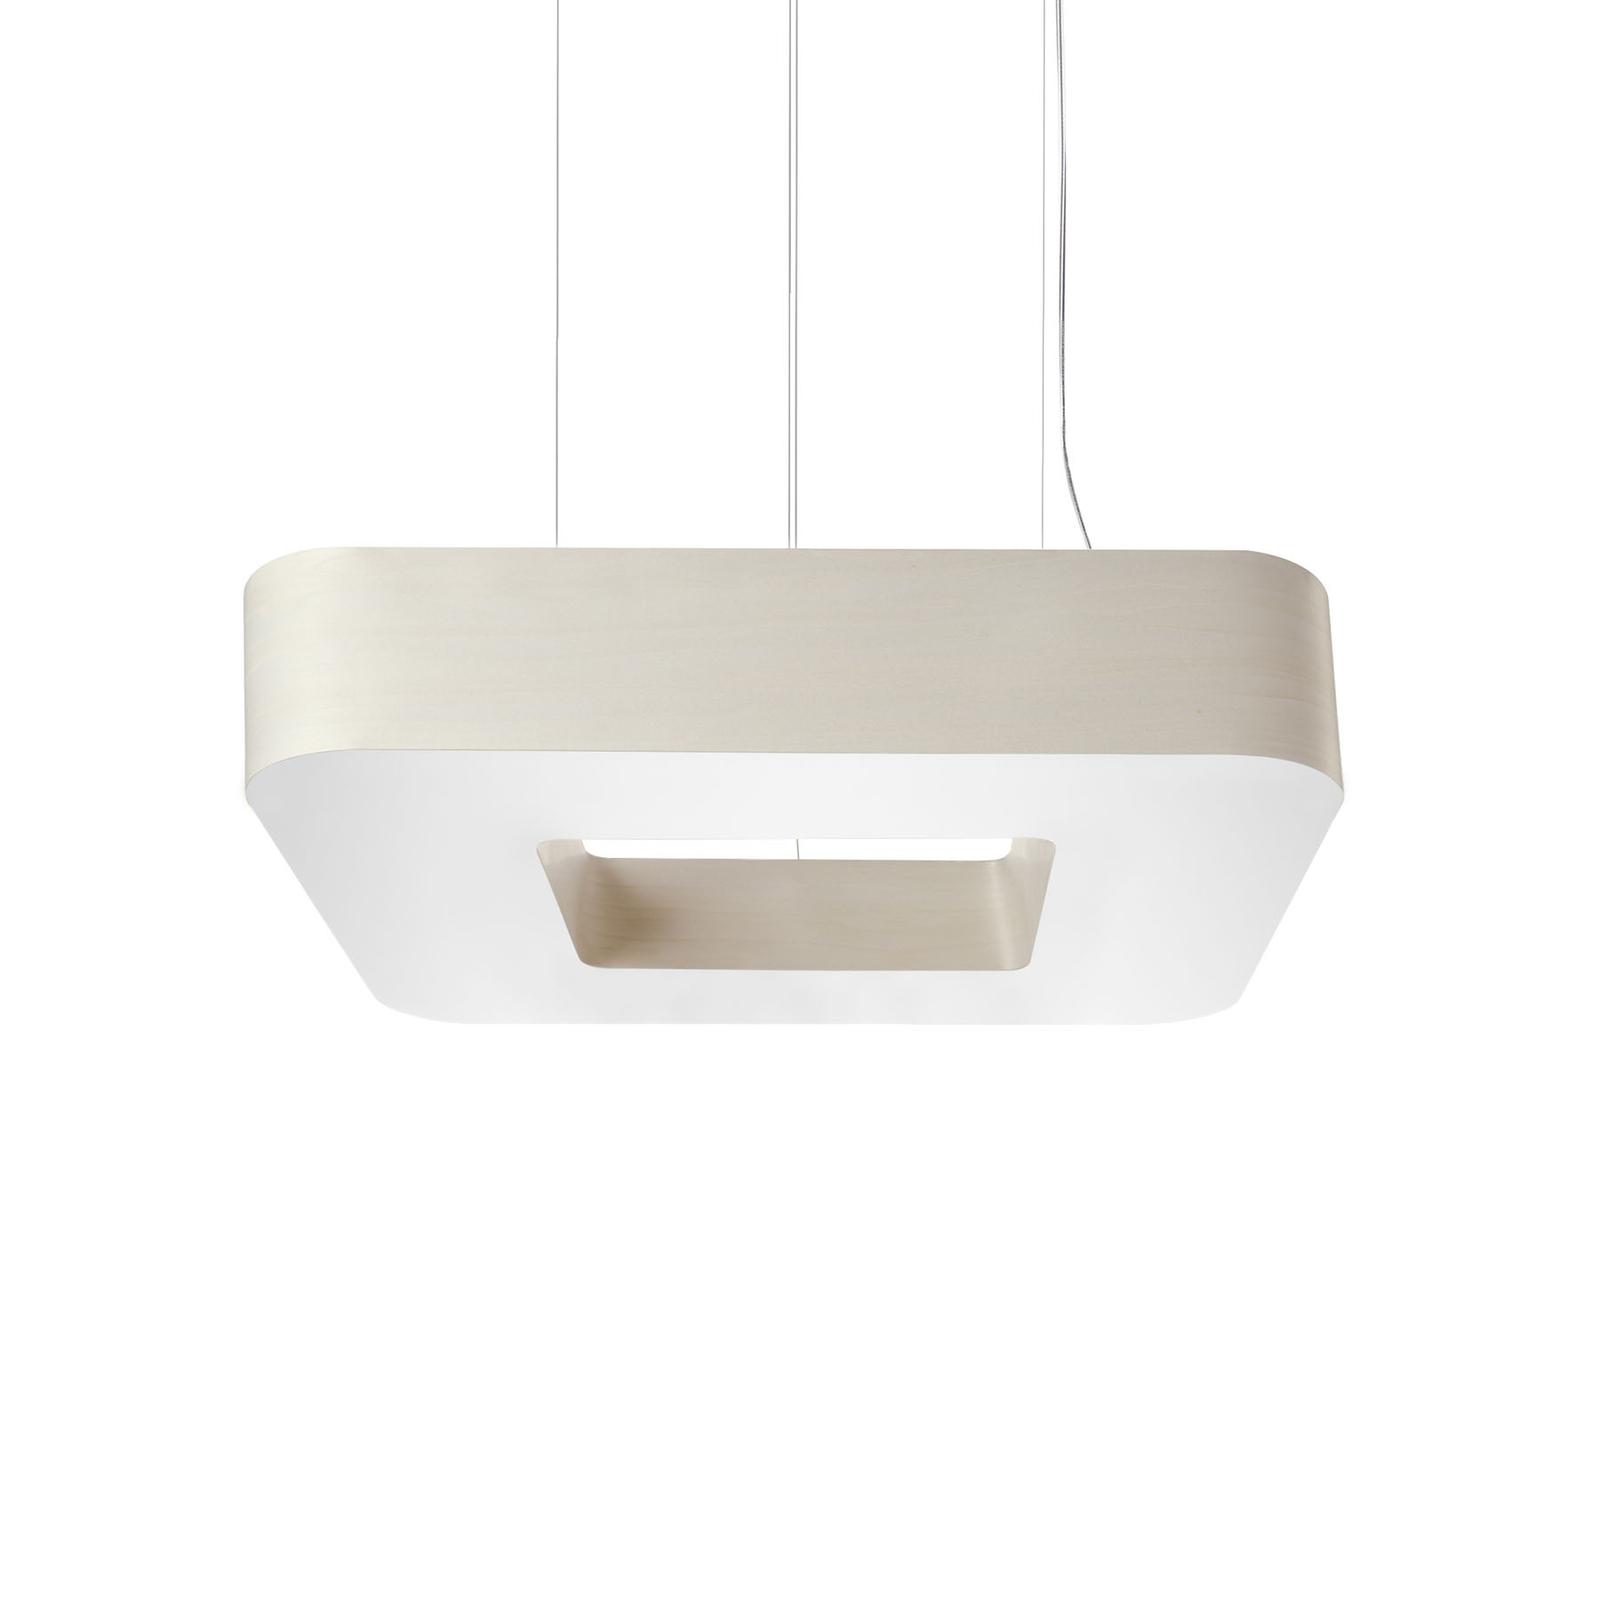 LZF Cuad suspension LED 0-10V dim, ivoire